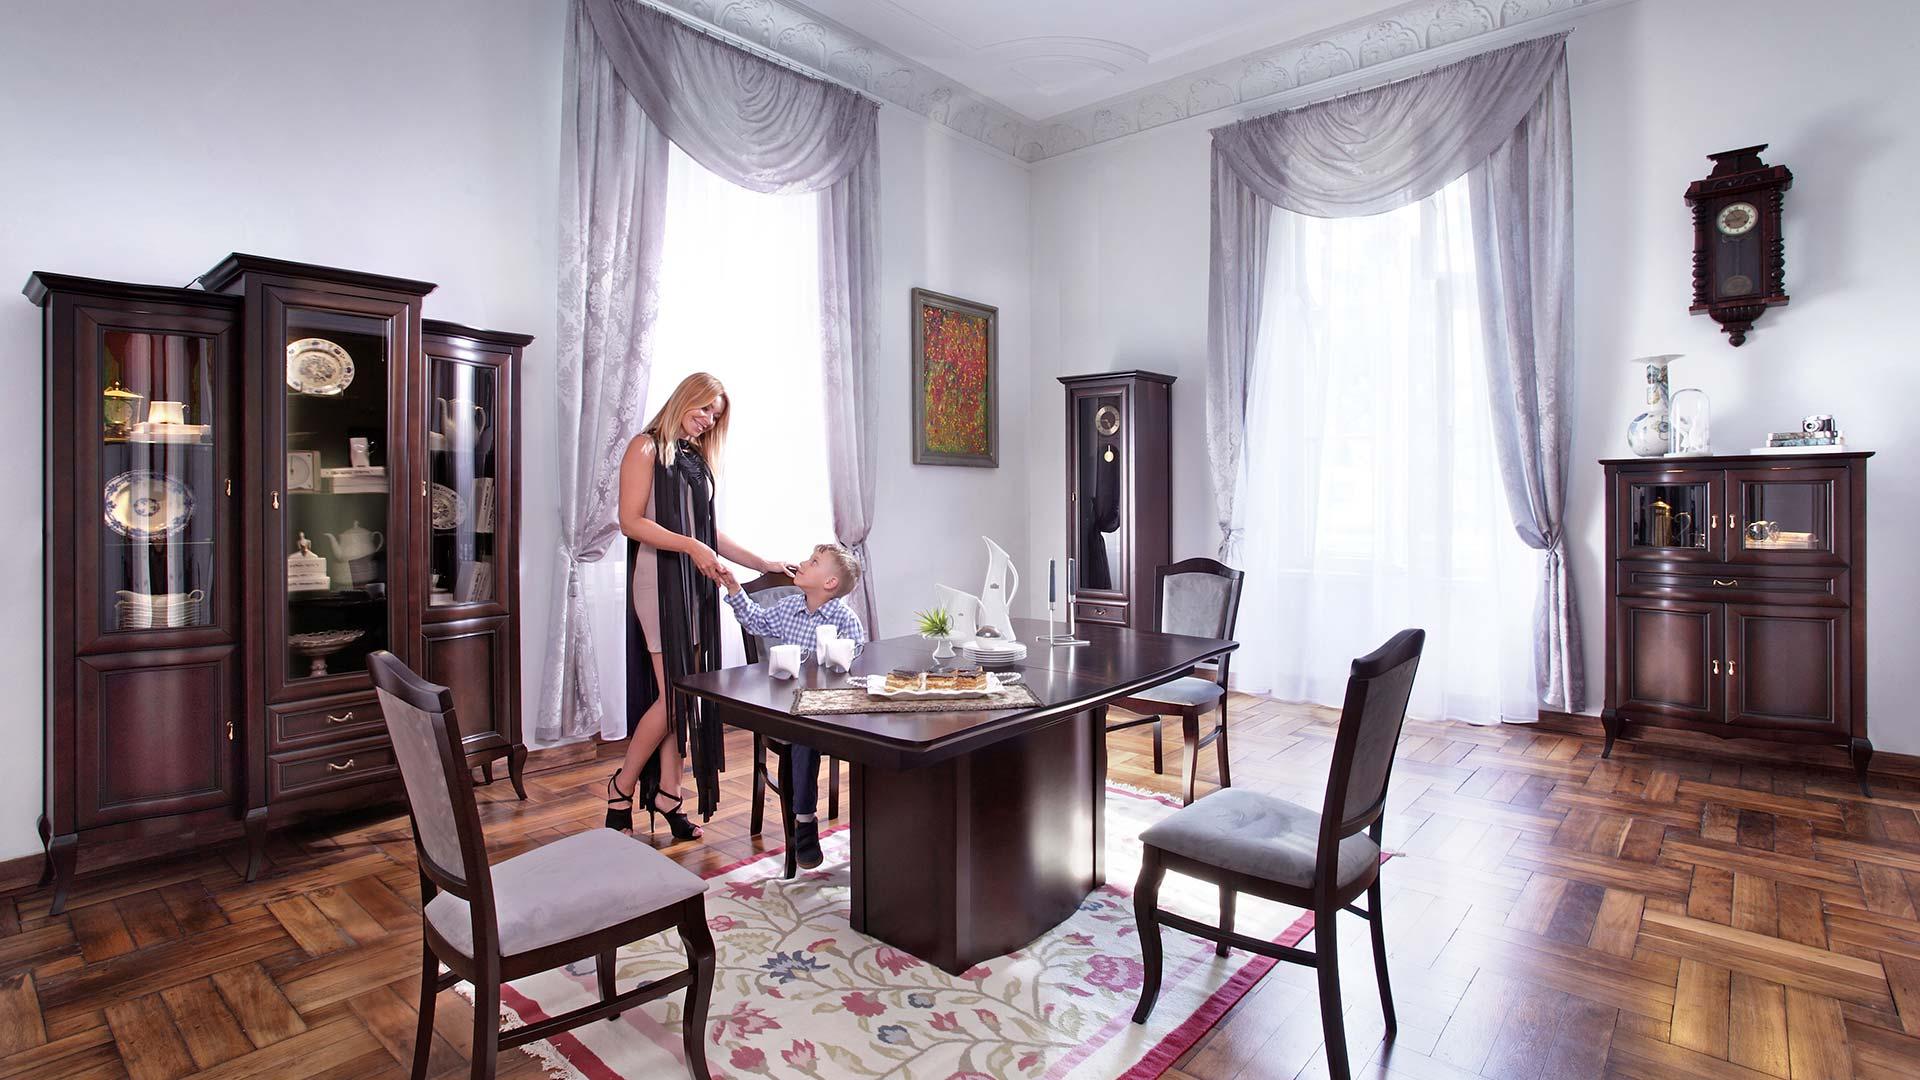 massivholzm bel schlafzimmer wohnzimmerm bel. Black Bedroom Furniture Sets. Home Design Ideas